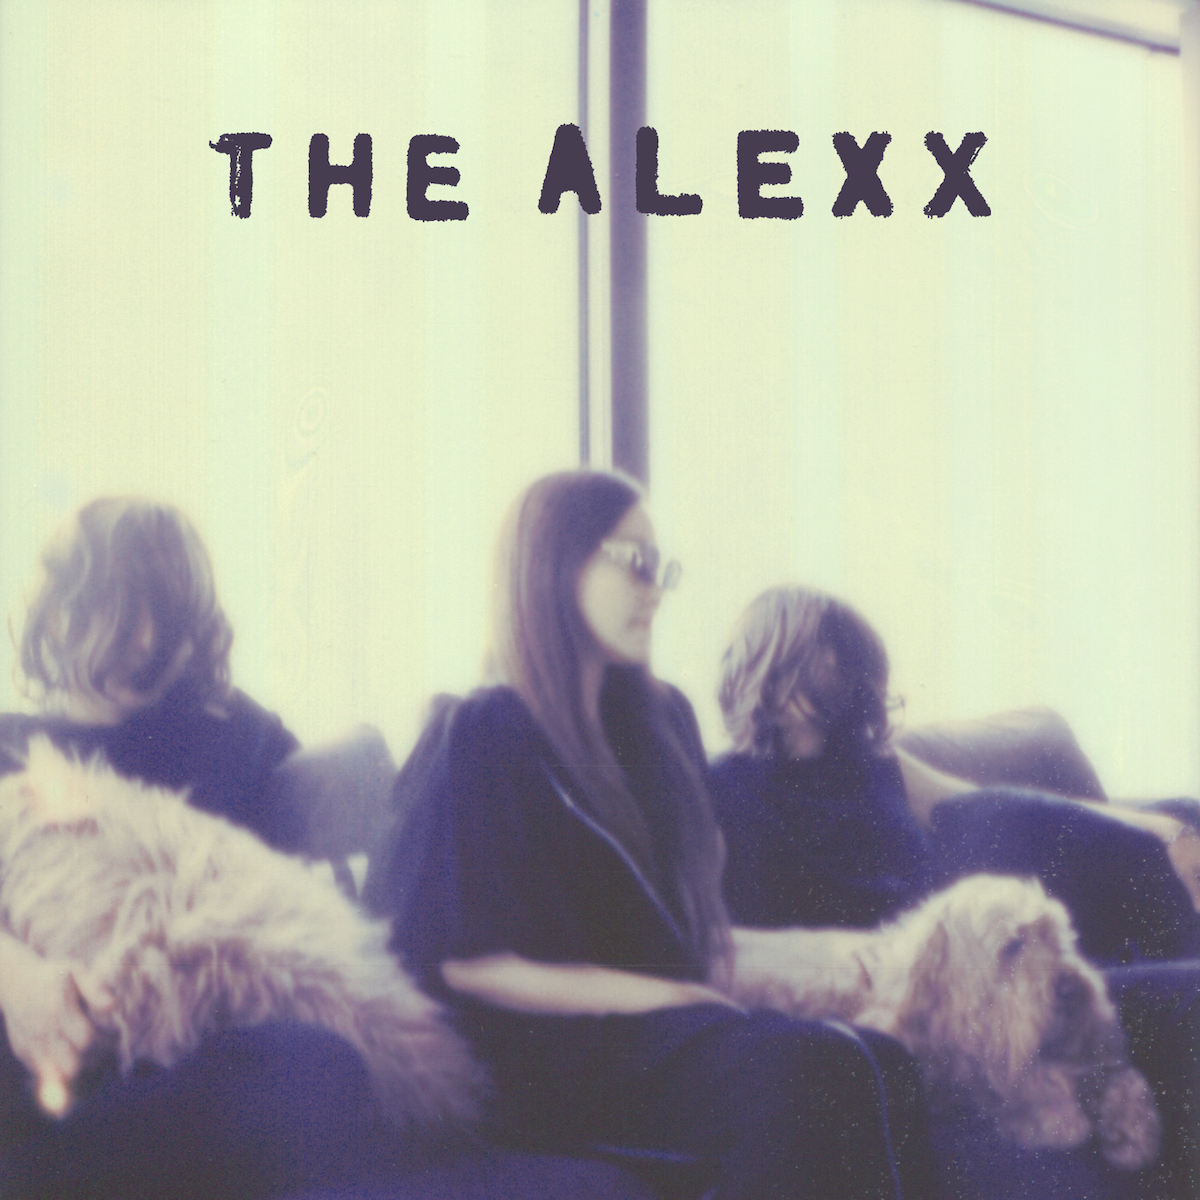 THE ALEXX